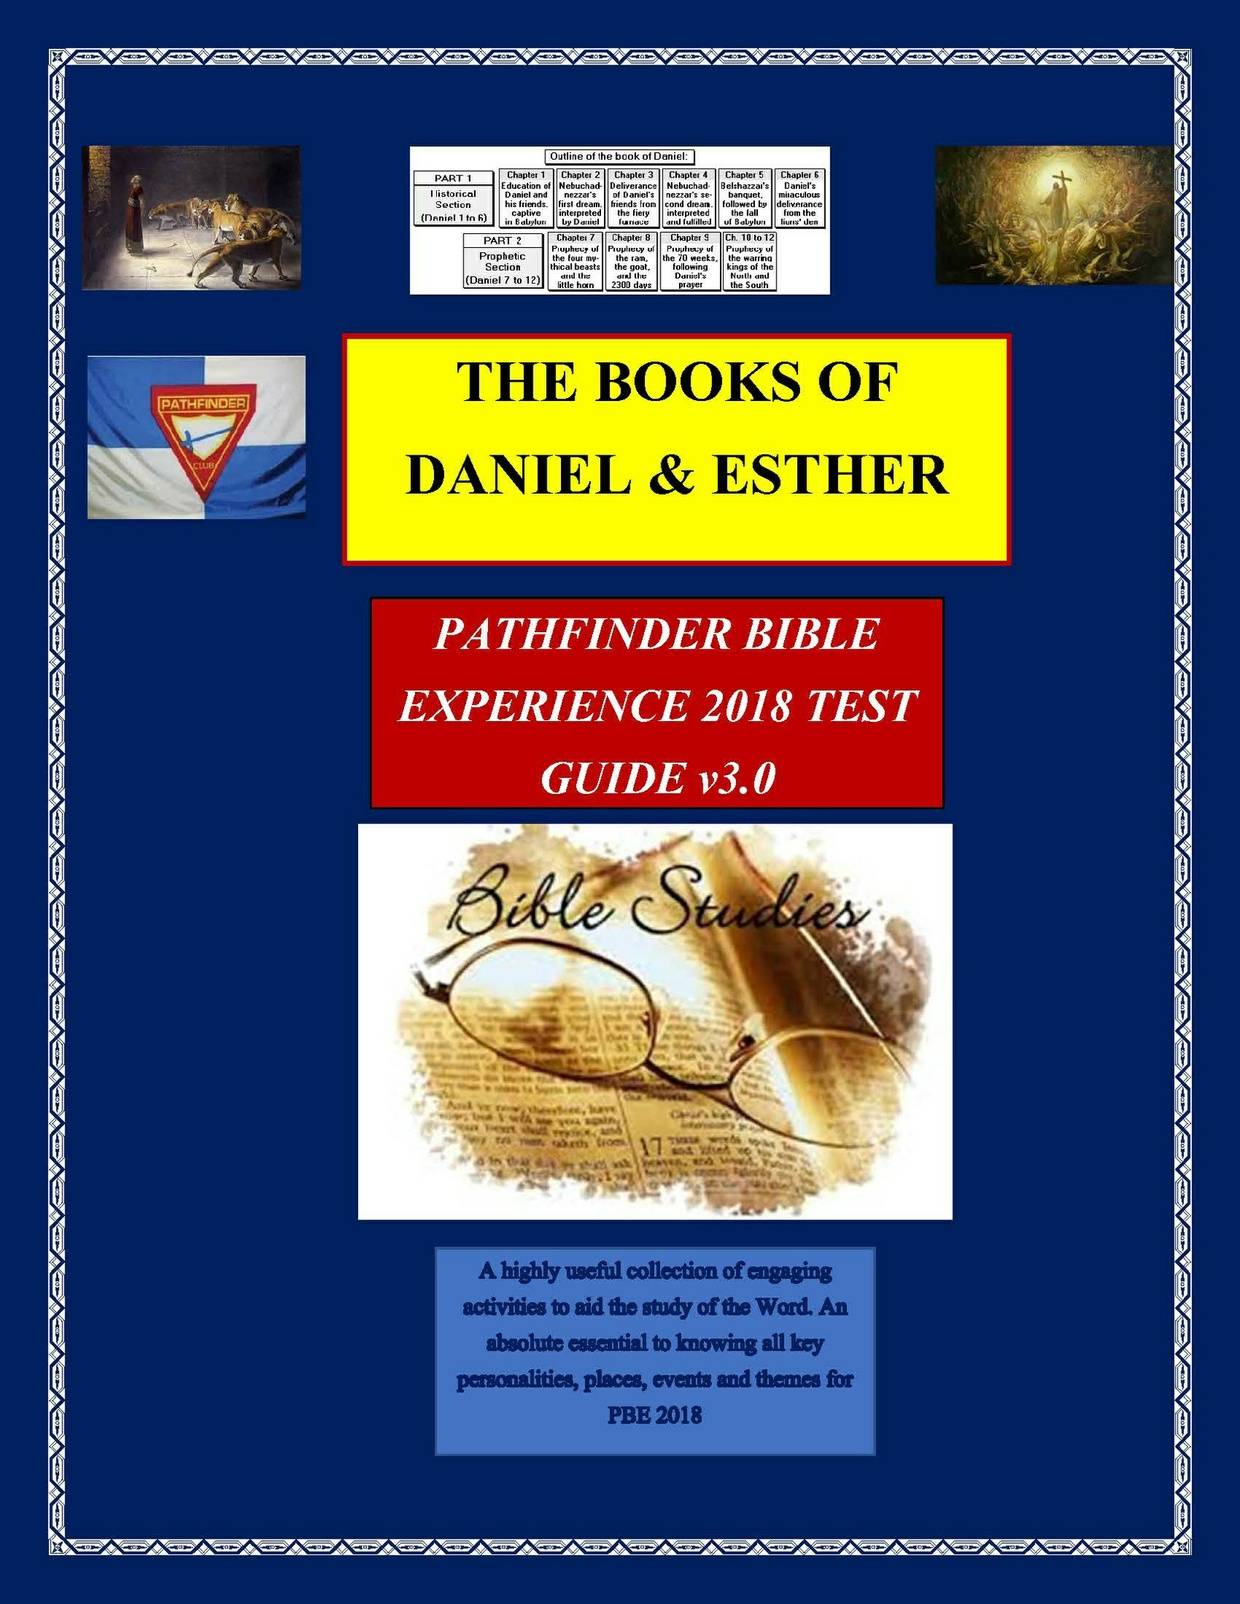 PBE 2018 - BOOK OF DANIEL & ESTHER